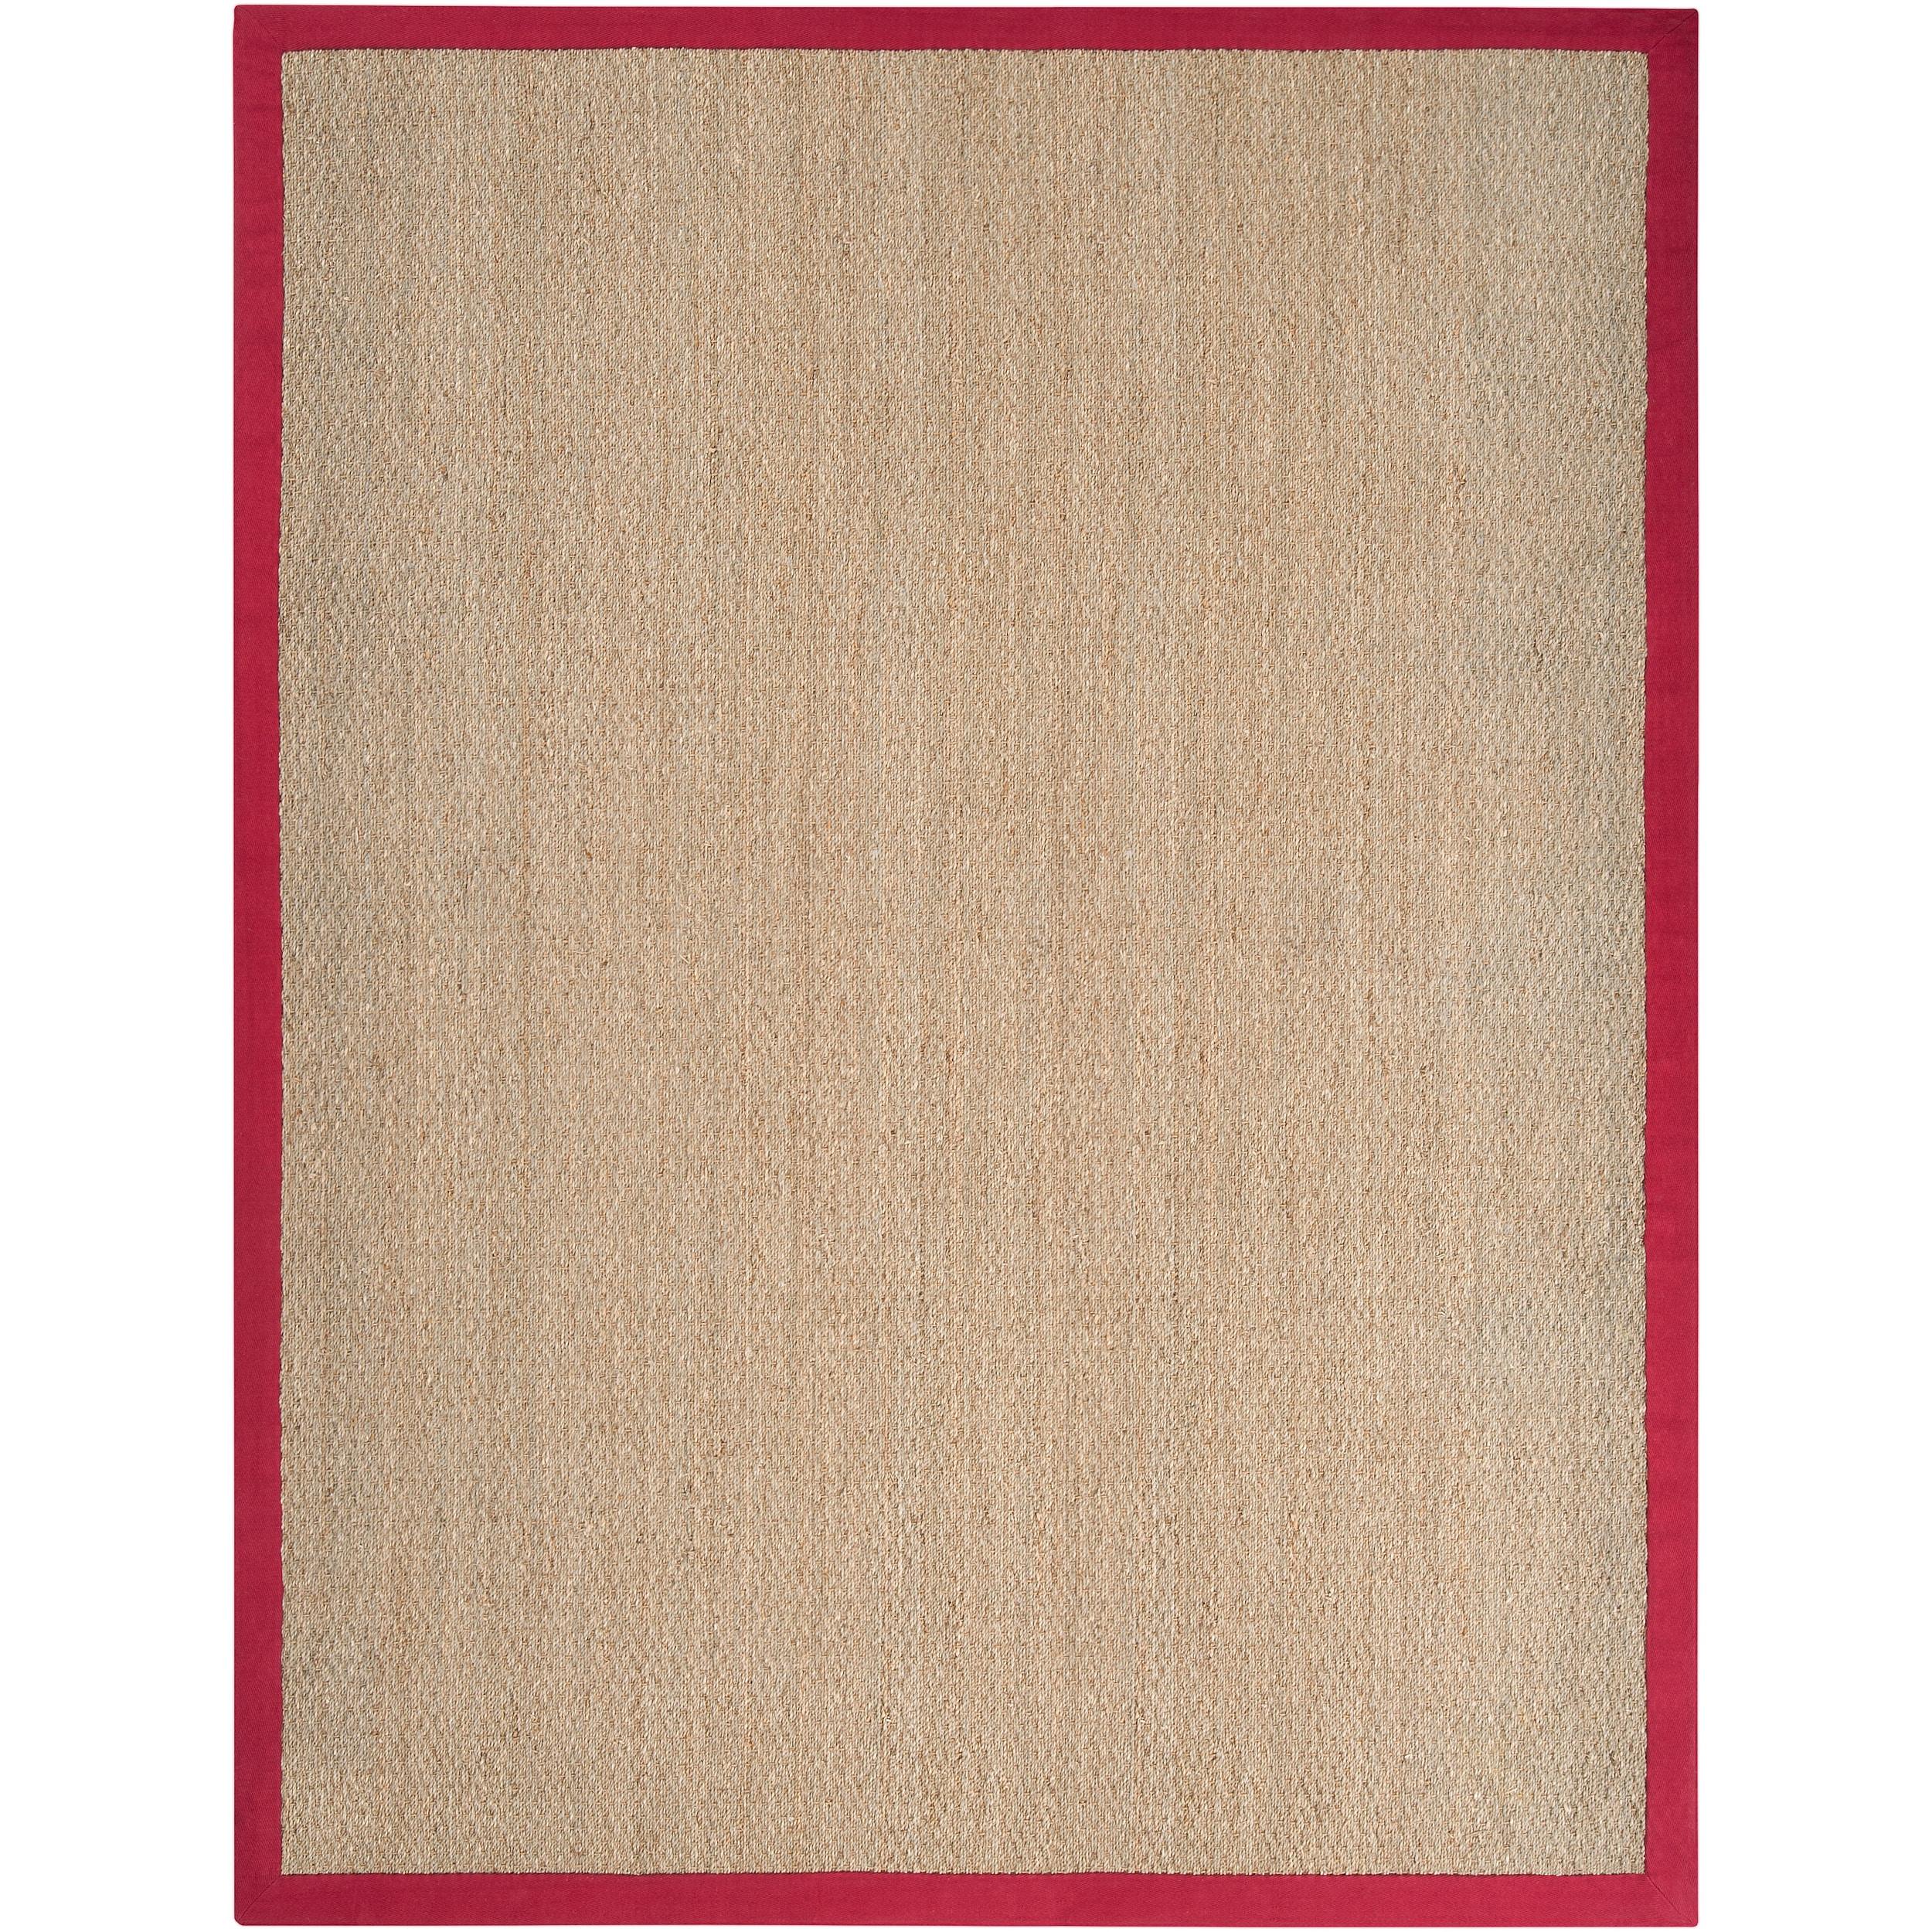 Hand-woven Natural Fiber Seagrass Cotton Border Beige Carnegie Rug (8' x 10')